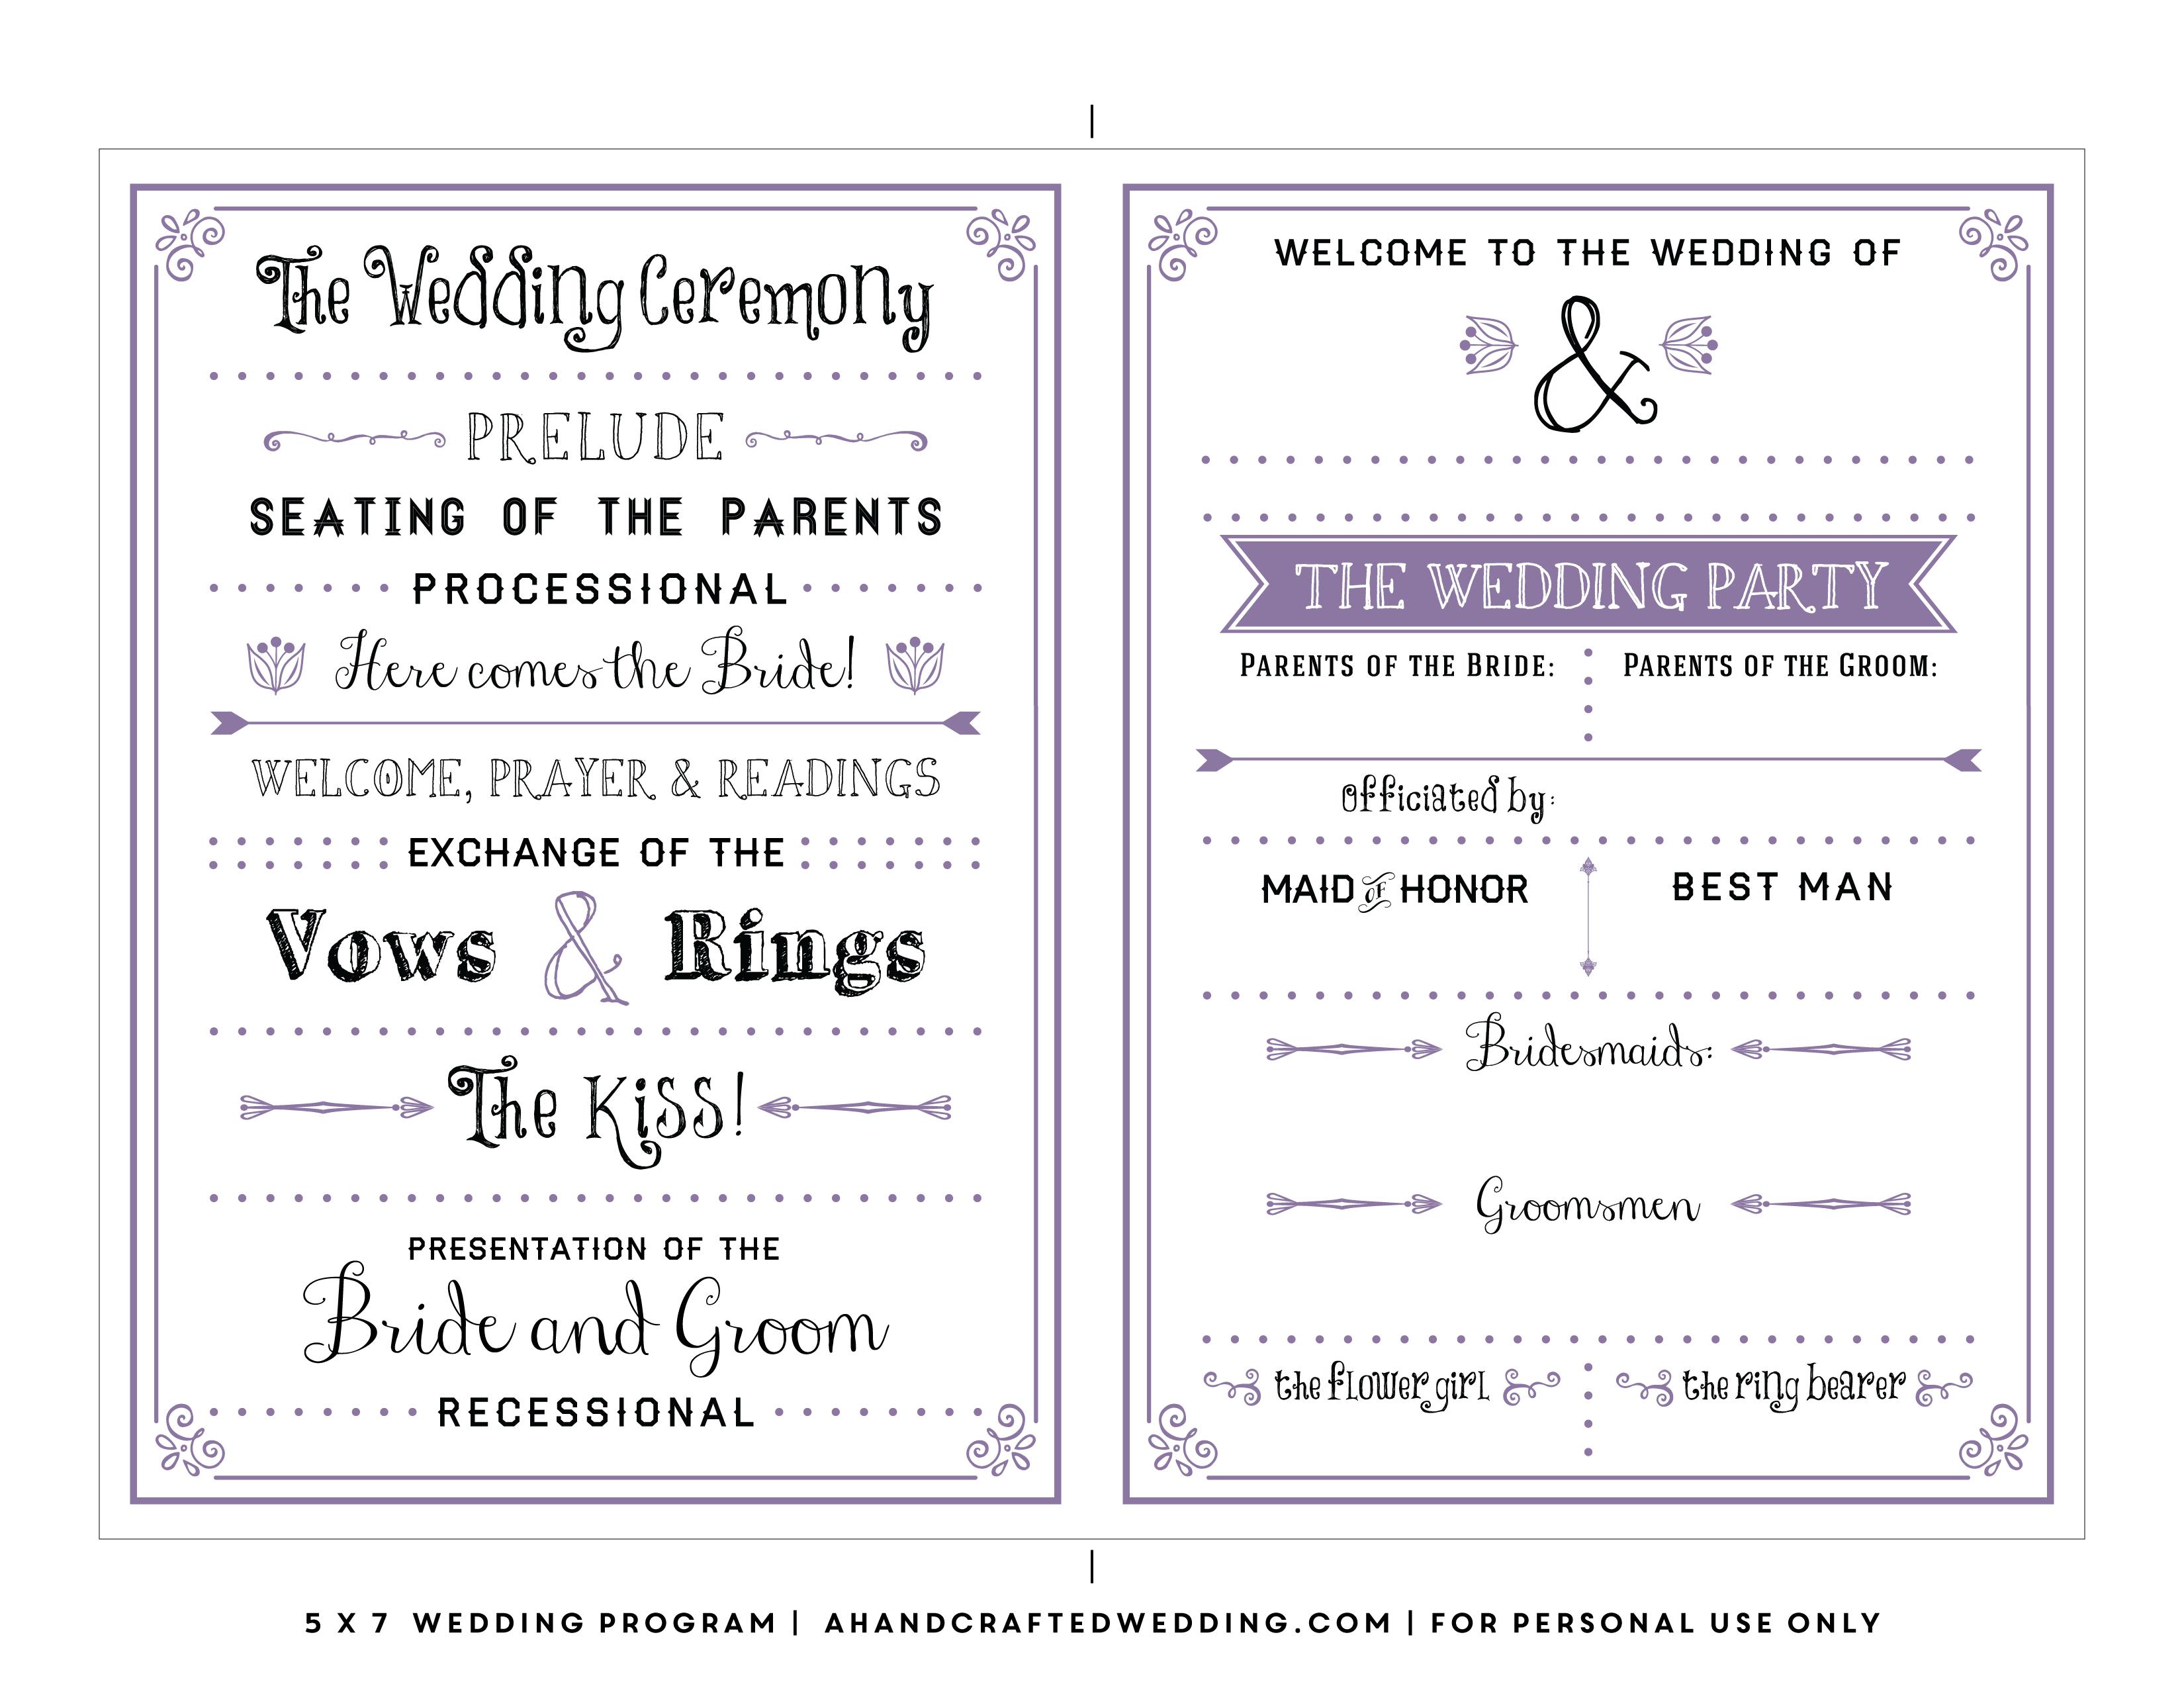 Free Printable Wedding Program Templates Best Template Examples With - Free Printable Wedding Programs